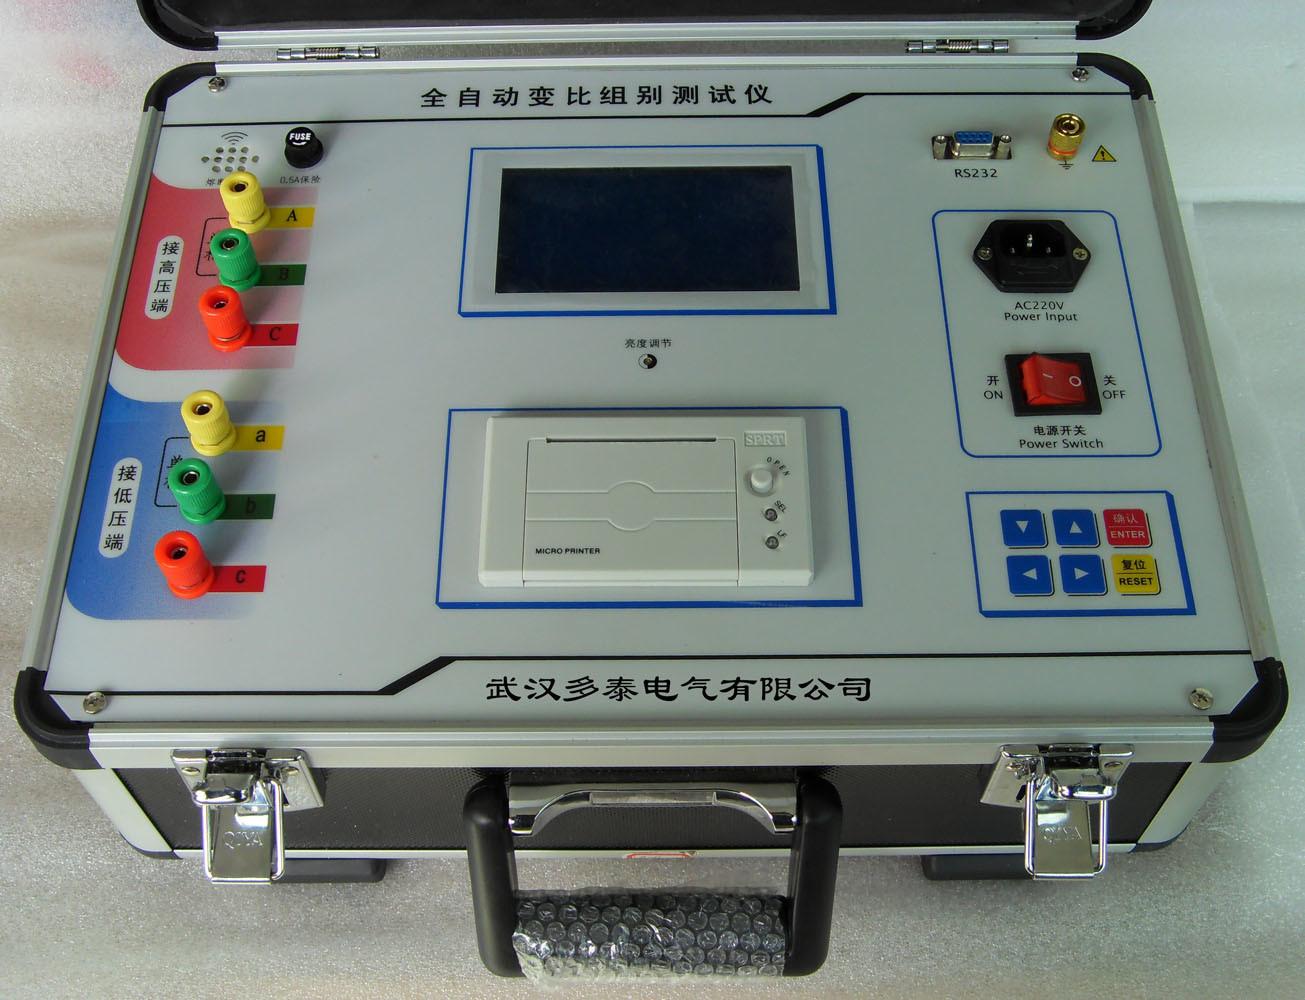 Transformer turns ratio tester